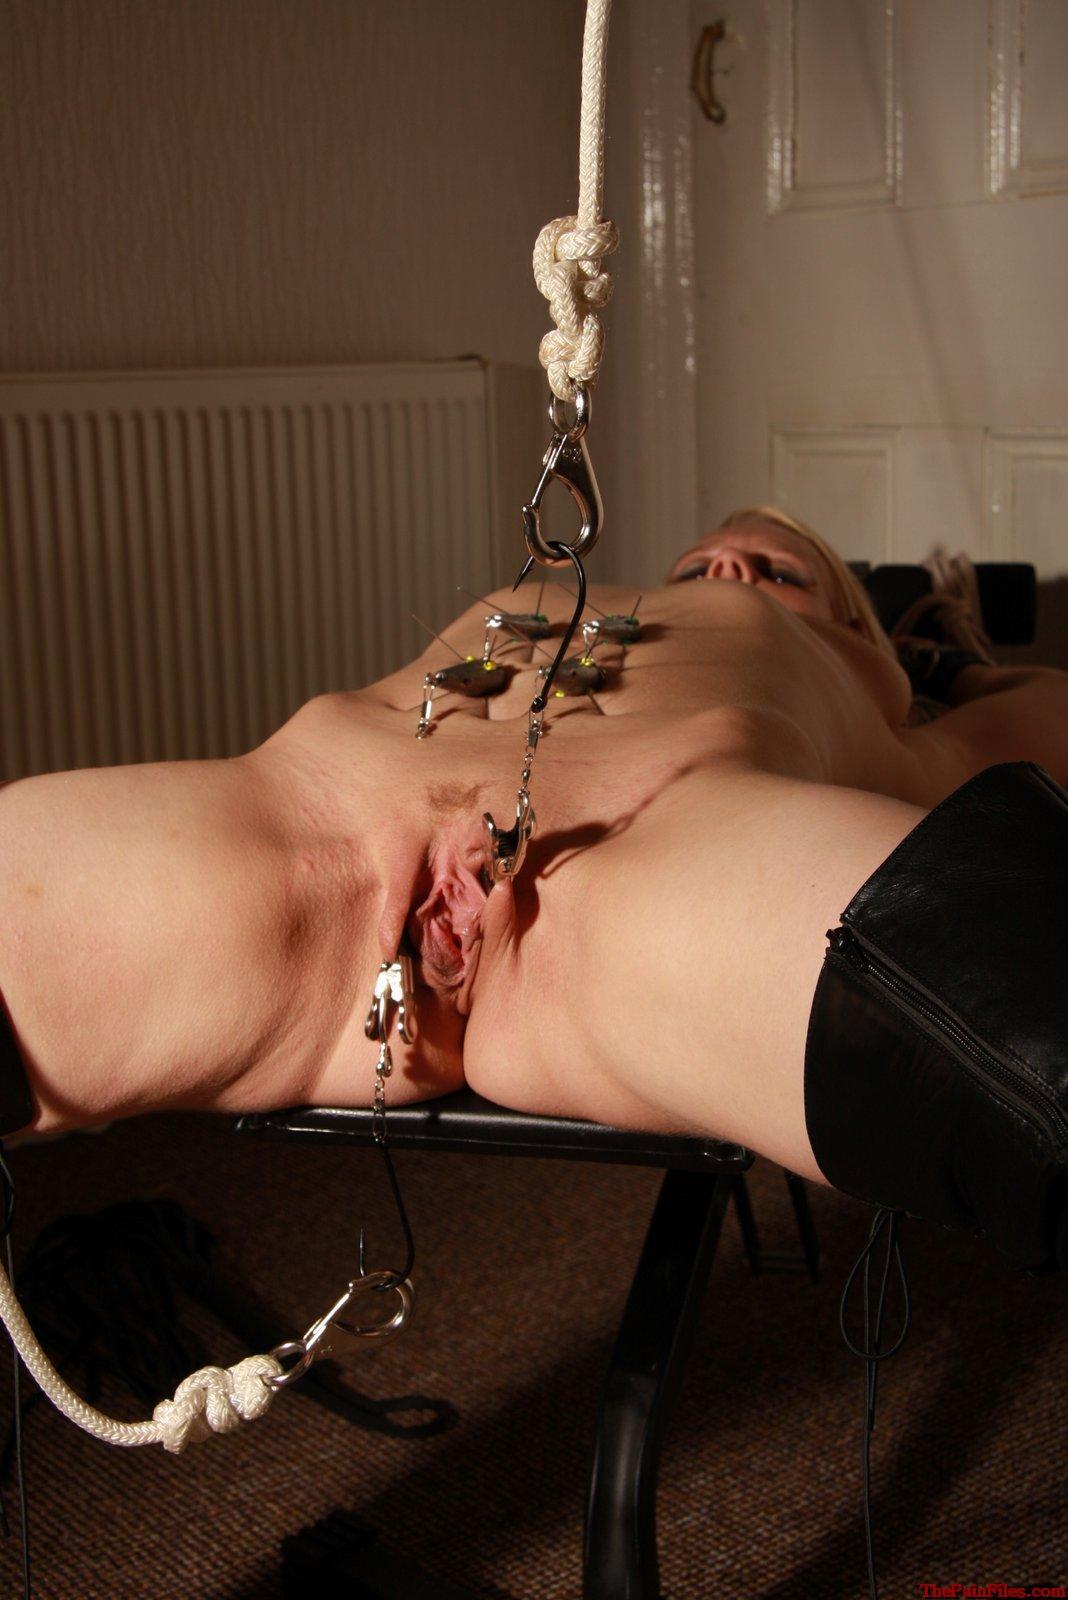 Cuckold Extreme Nipple Torture Free Xxx Galeries